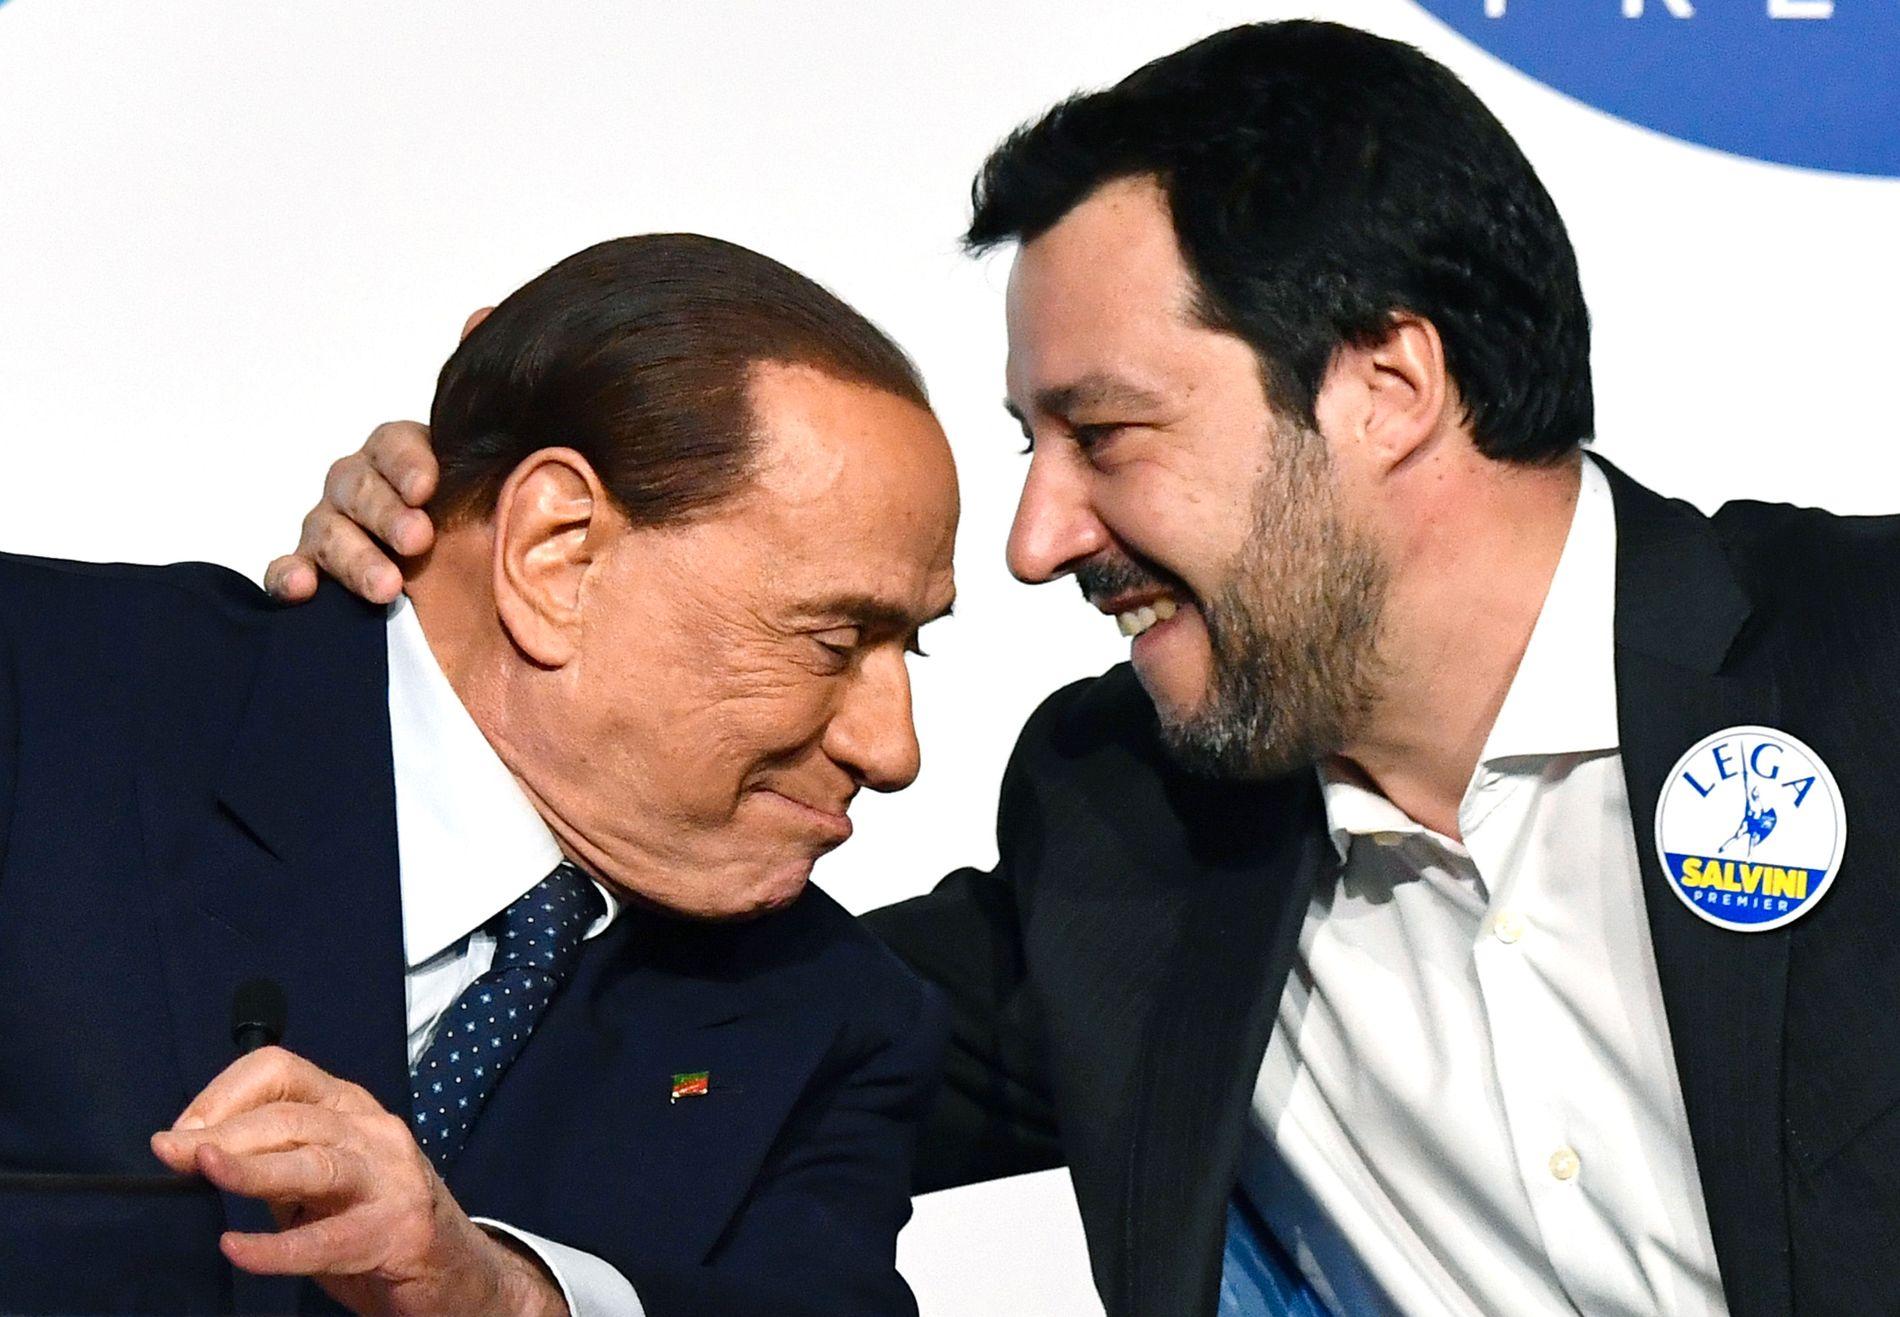 SAMMEN I VALGET: Silvio Berlusconis konservative Forza Italia har sanket stemmer sammen med Matteo Salvinis EU-skeptiske og innvandringsfiendlige Lega.